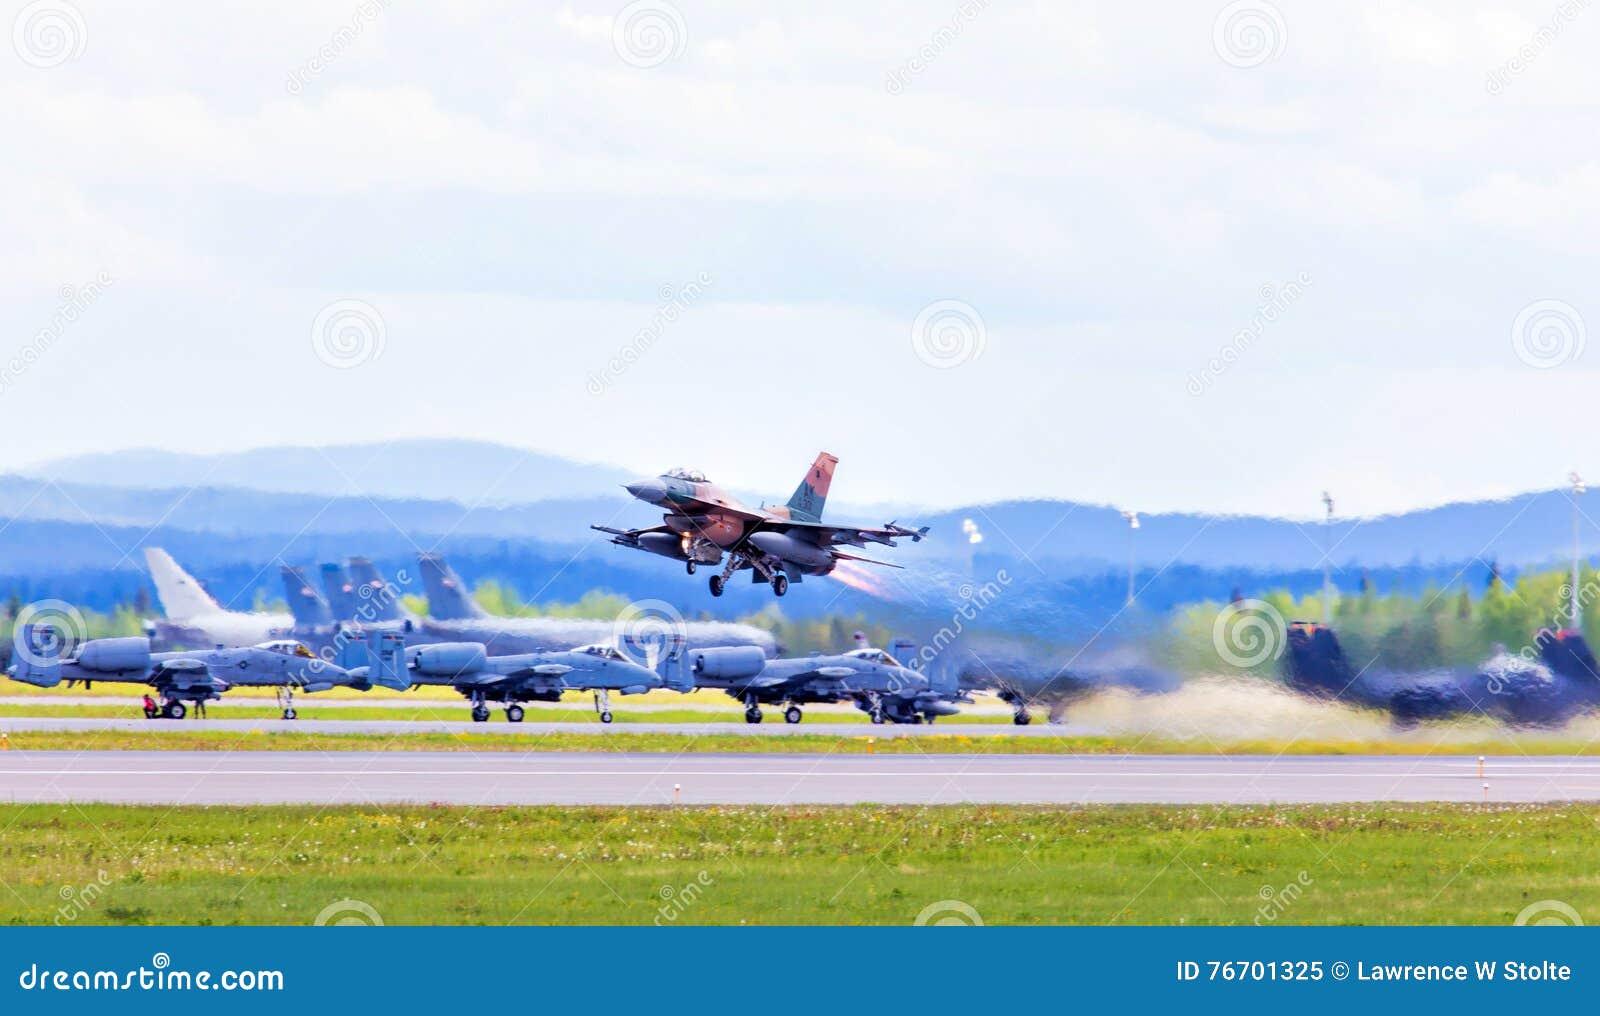 Jet Taking Off #2